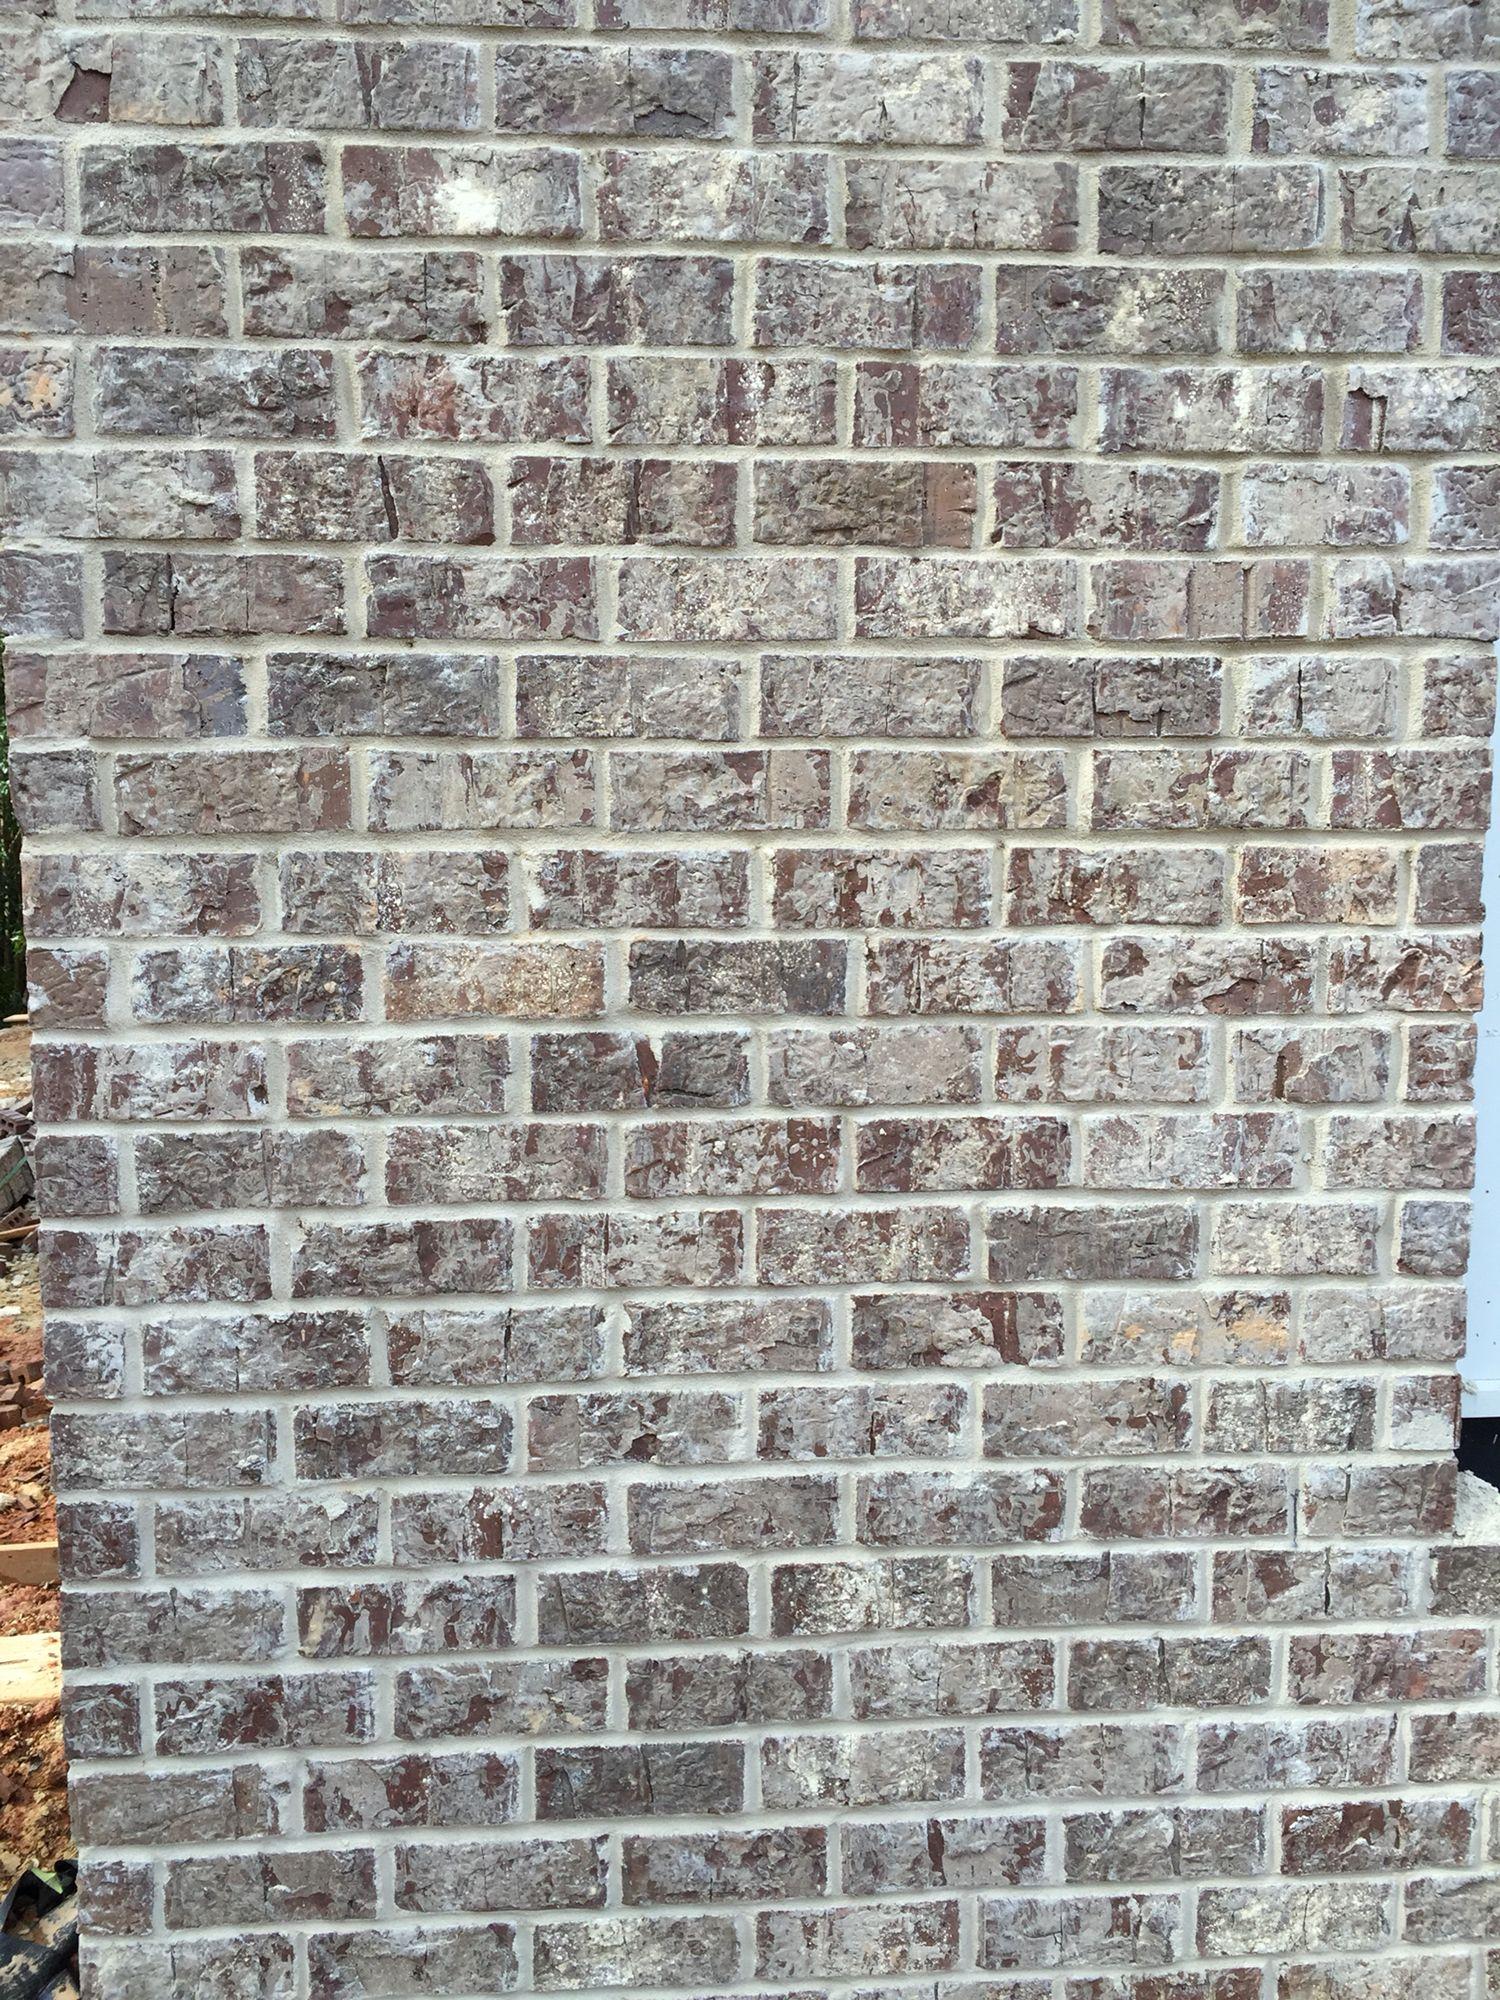 Brick Stonewall Mortar Anti Buff Brick Close Ups In